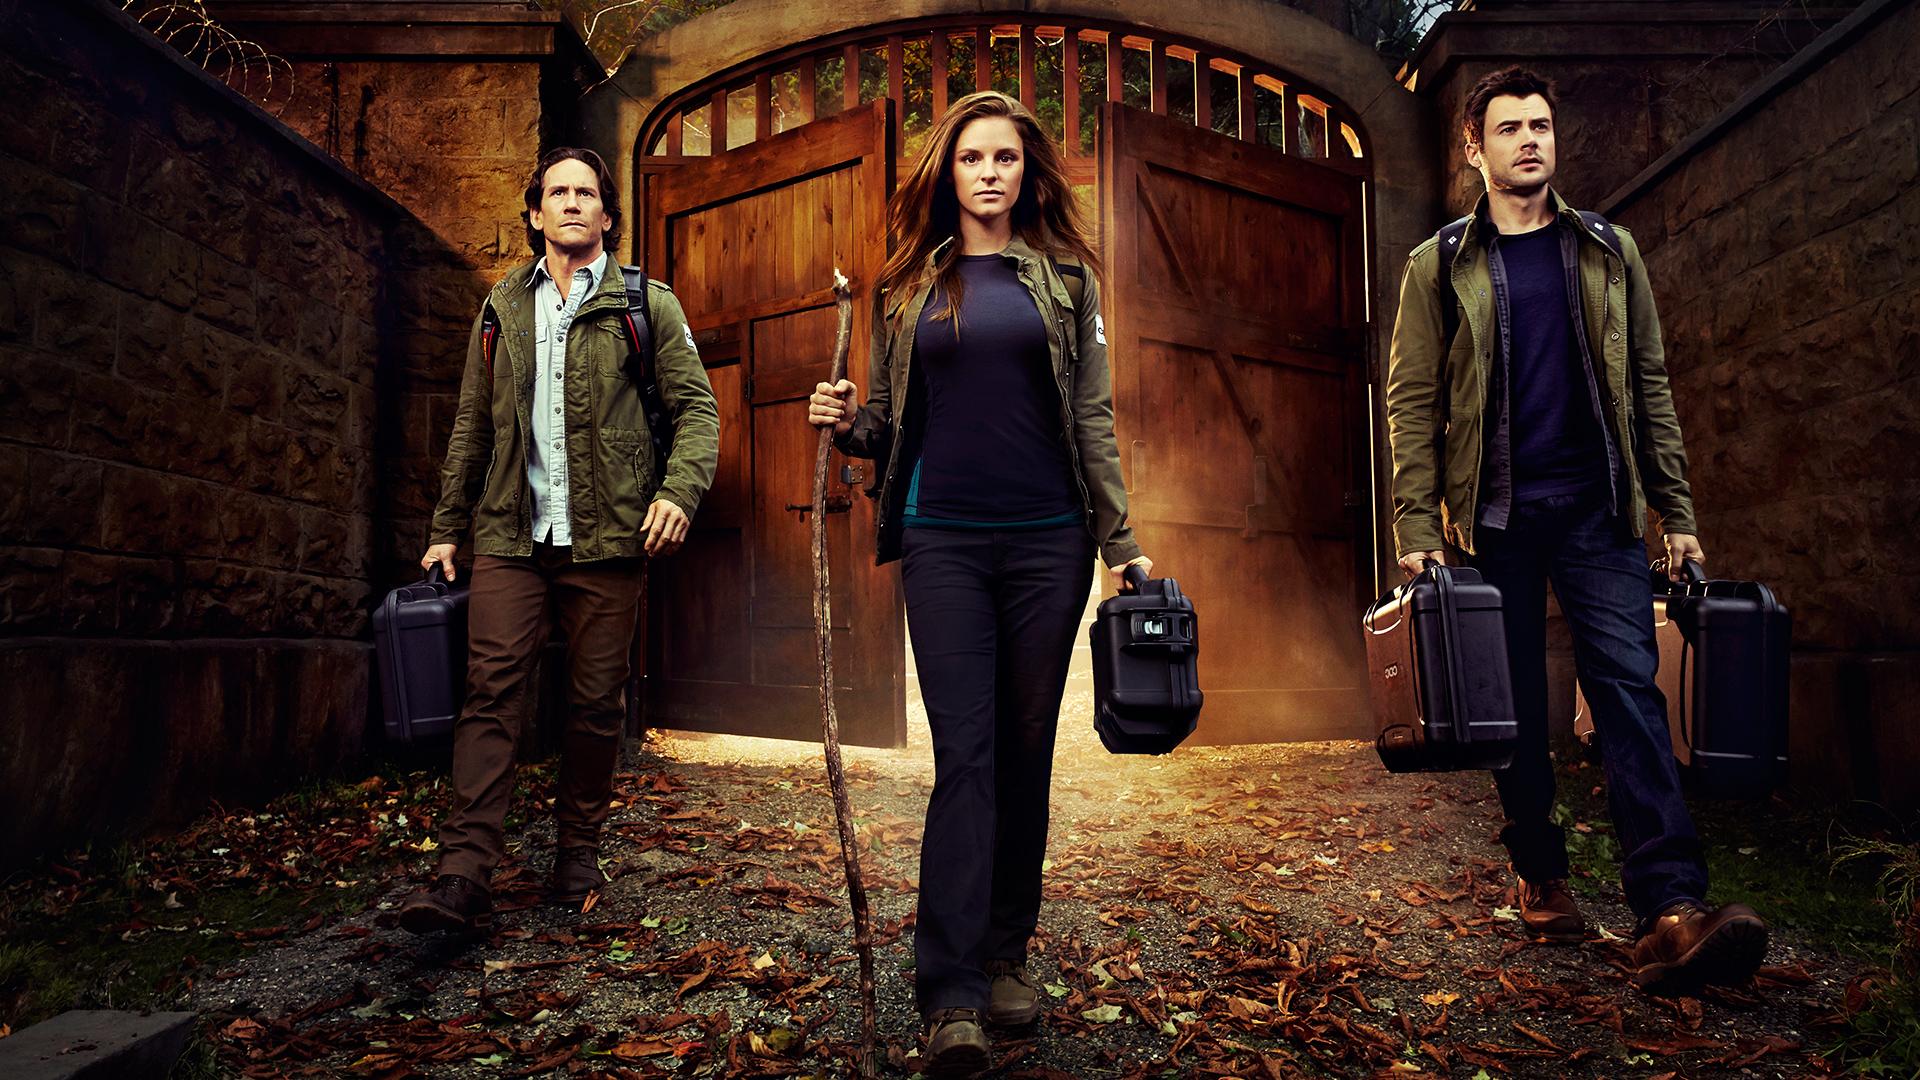 Syfy Watch Full Episodes Helix Season 2 Cast